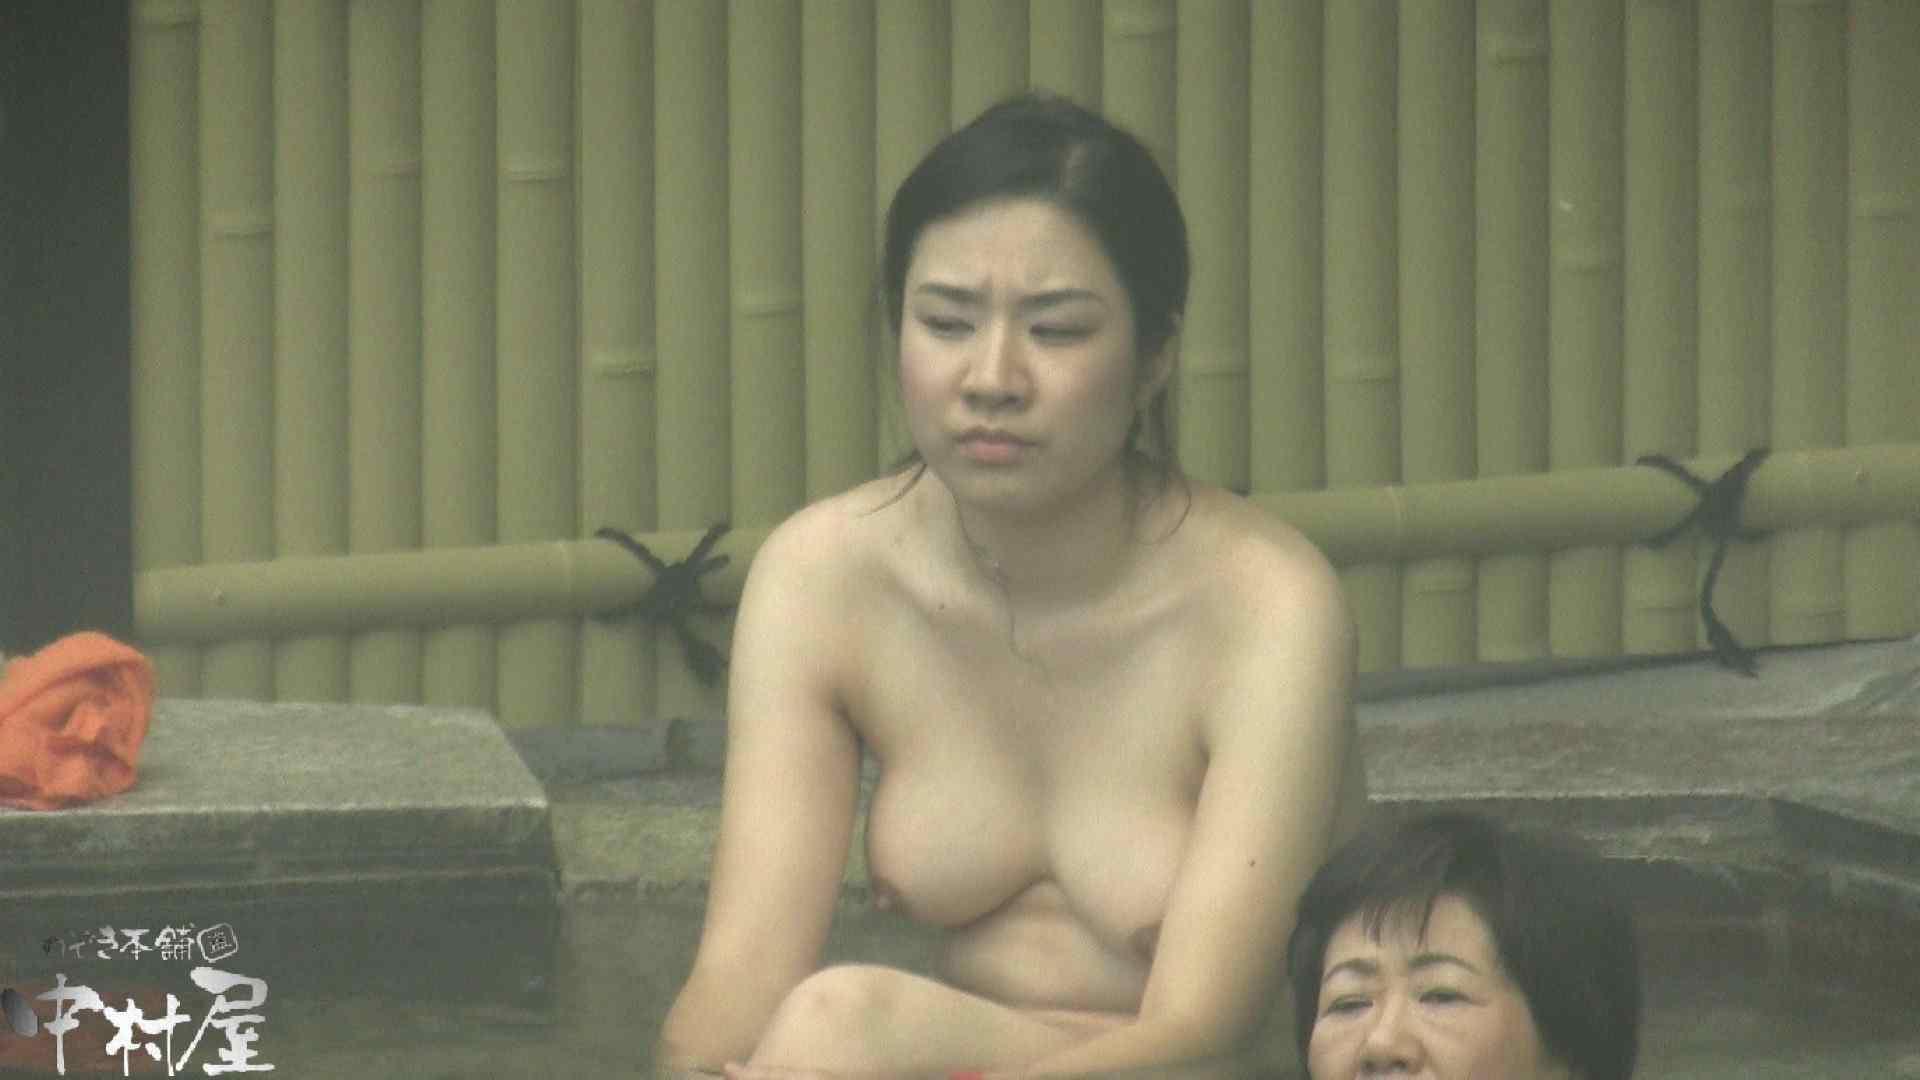 Aquaな露天風呂Vol.913 OLのエロ生活 すけべAV動画紹介 68連発 32